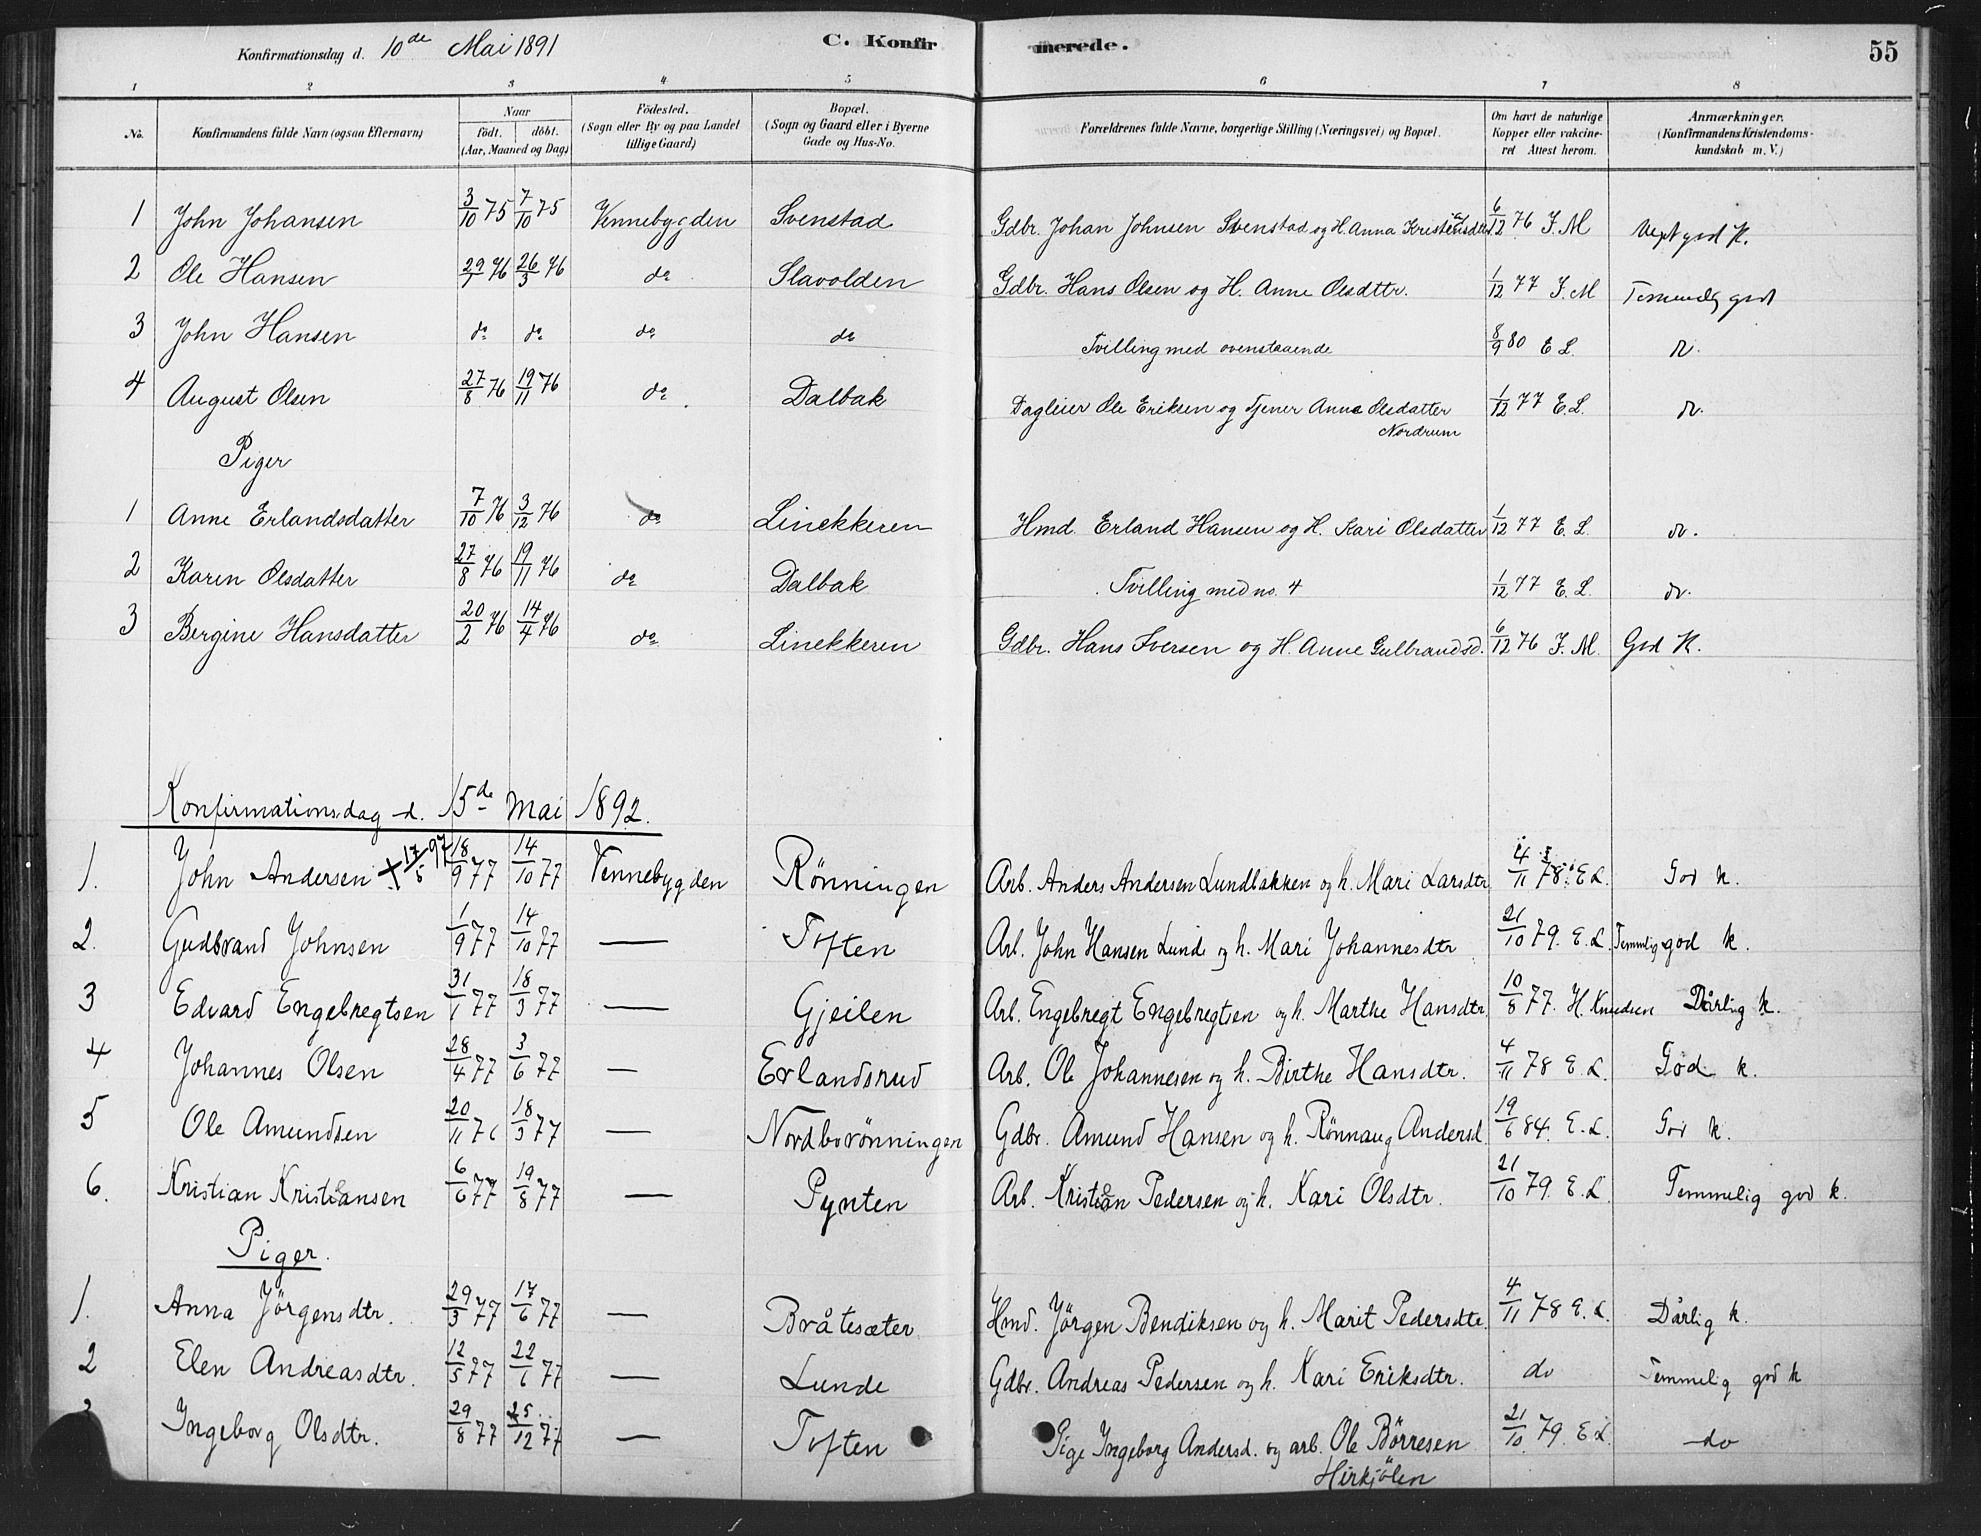 SAH, Ringebu prestekontor, Ministerialbok nr. 10, 1878-1898, s. 55